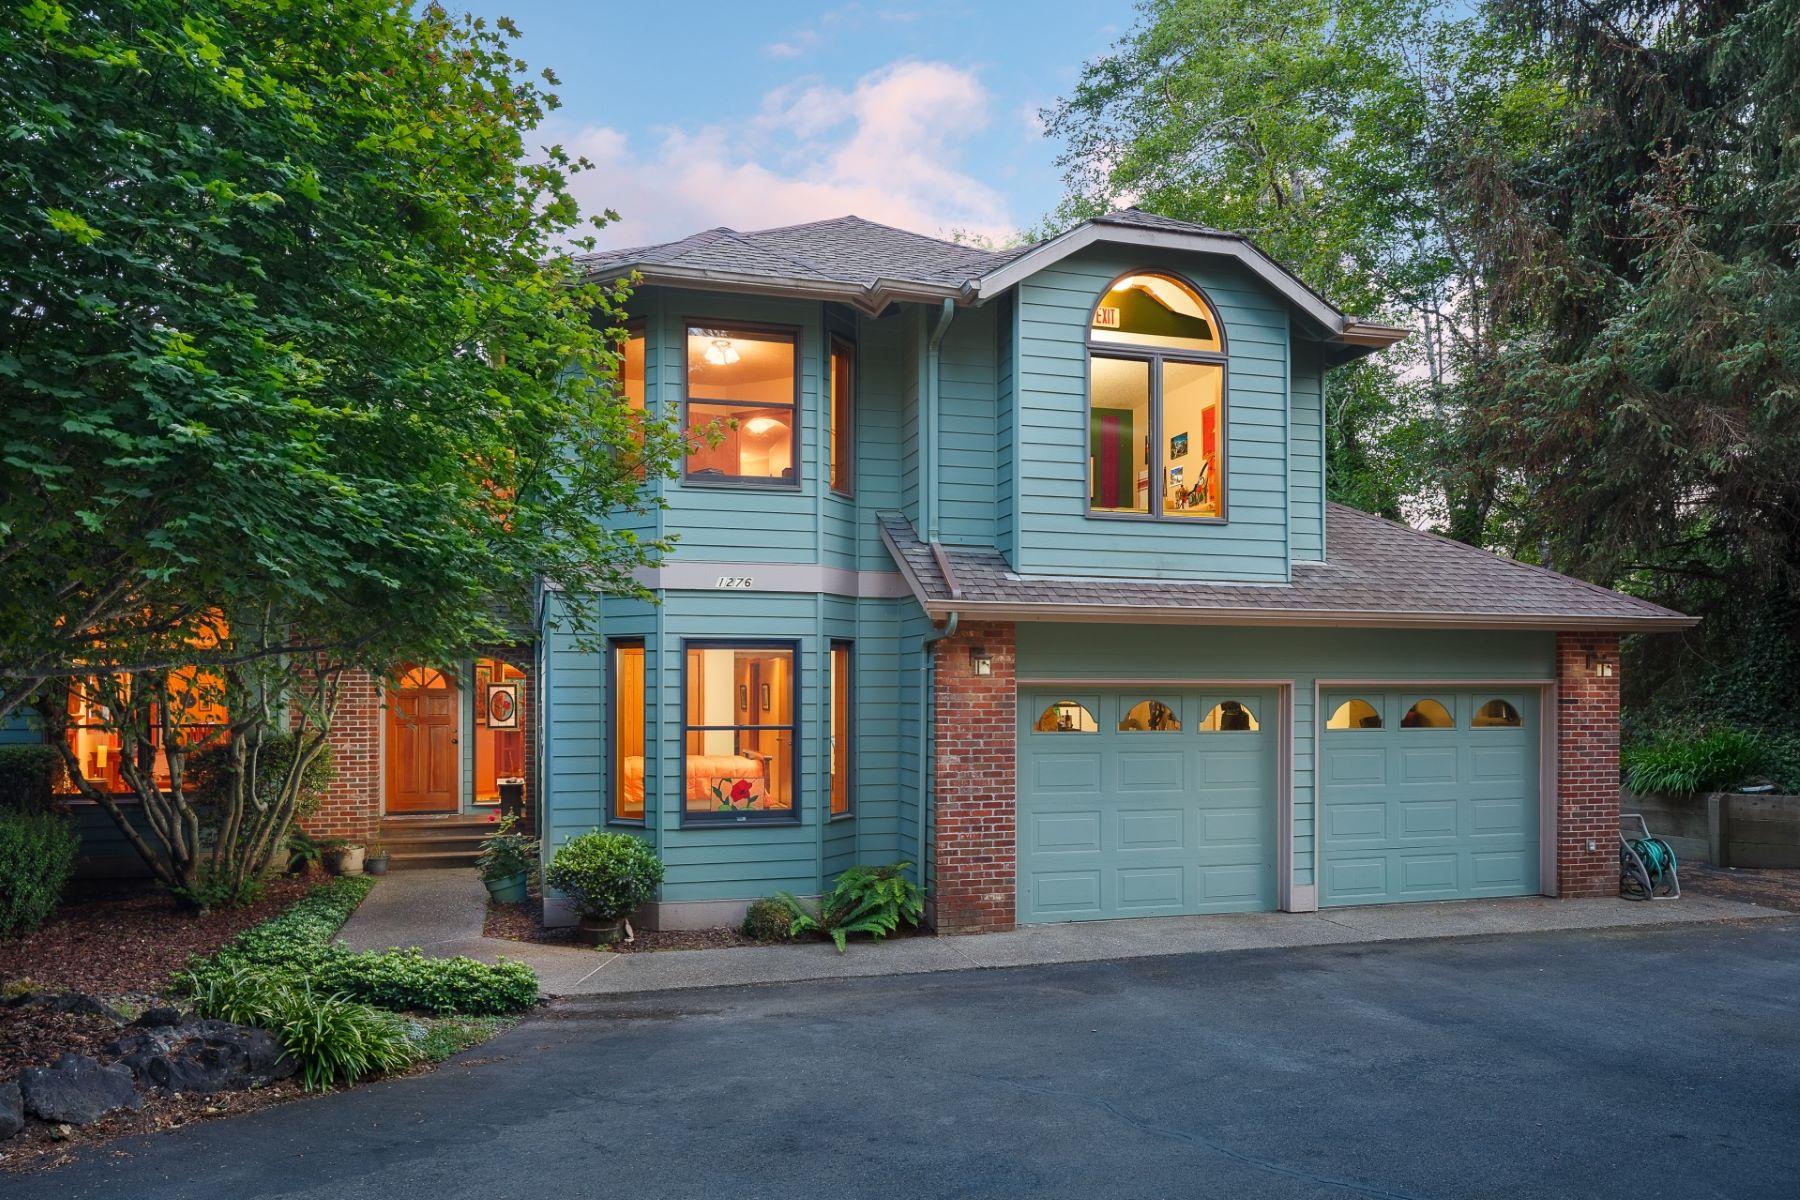 Other Residential Homes για την Πώληση στο 1276 NE LAKEWOOD Lincoln City, OR 97367 Lincoln City, Ορεγκον 97367 Ηνωμένες Πολιτείες